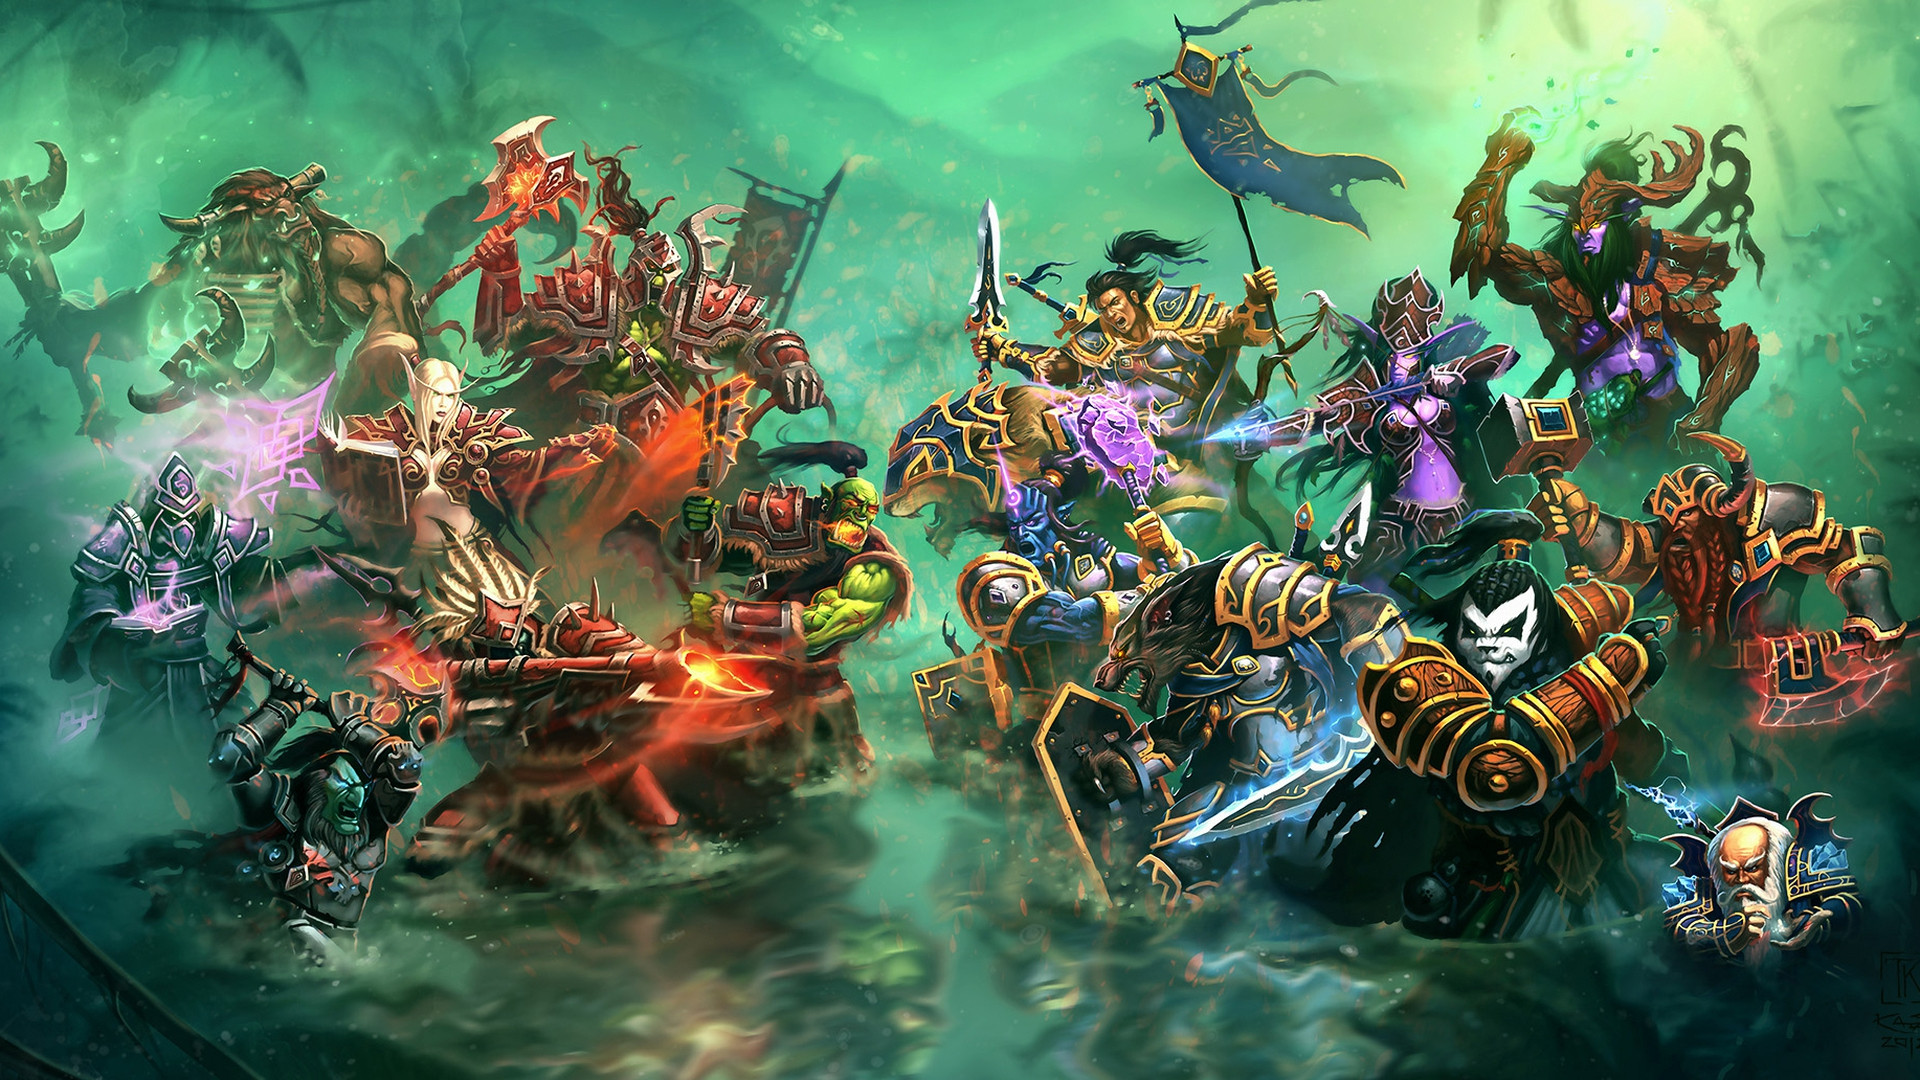 World Of Warcraft Wallpaper 1920x1080: Horde Wallpaper HD (68+ Images